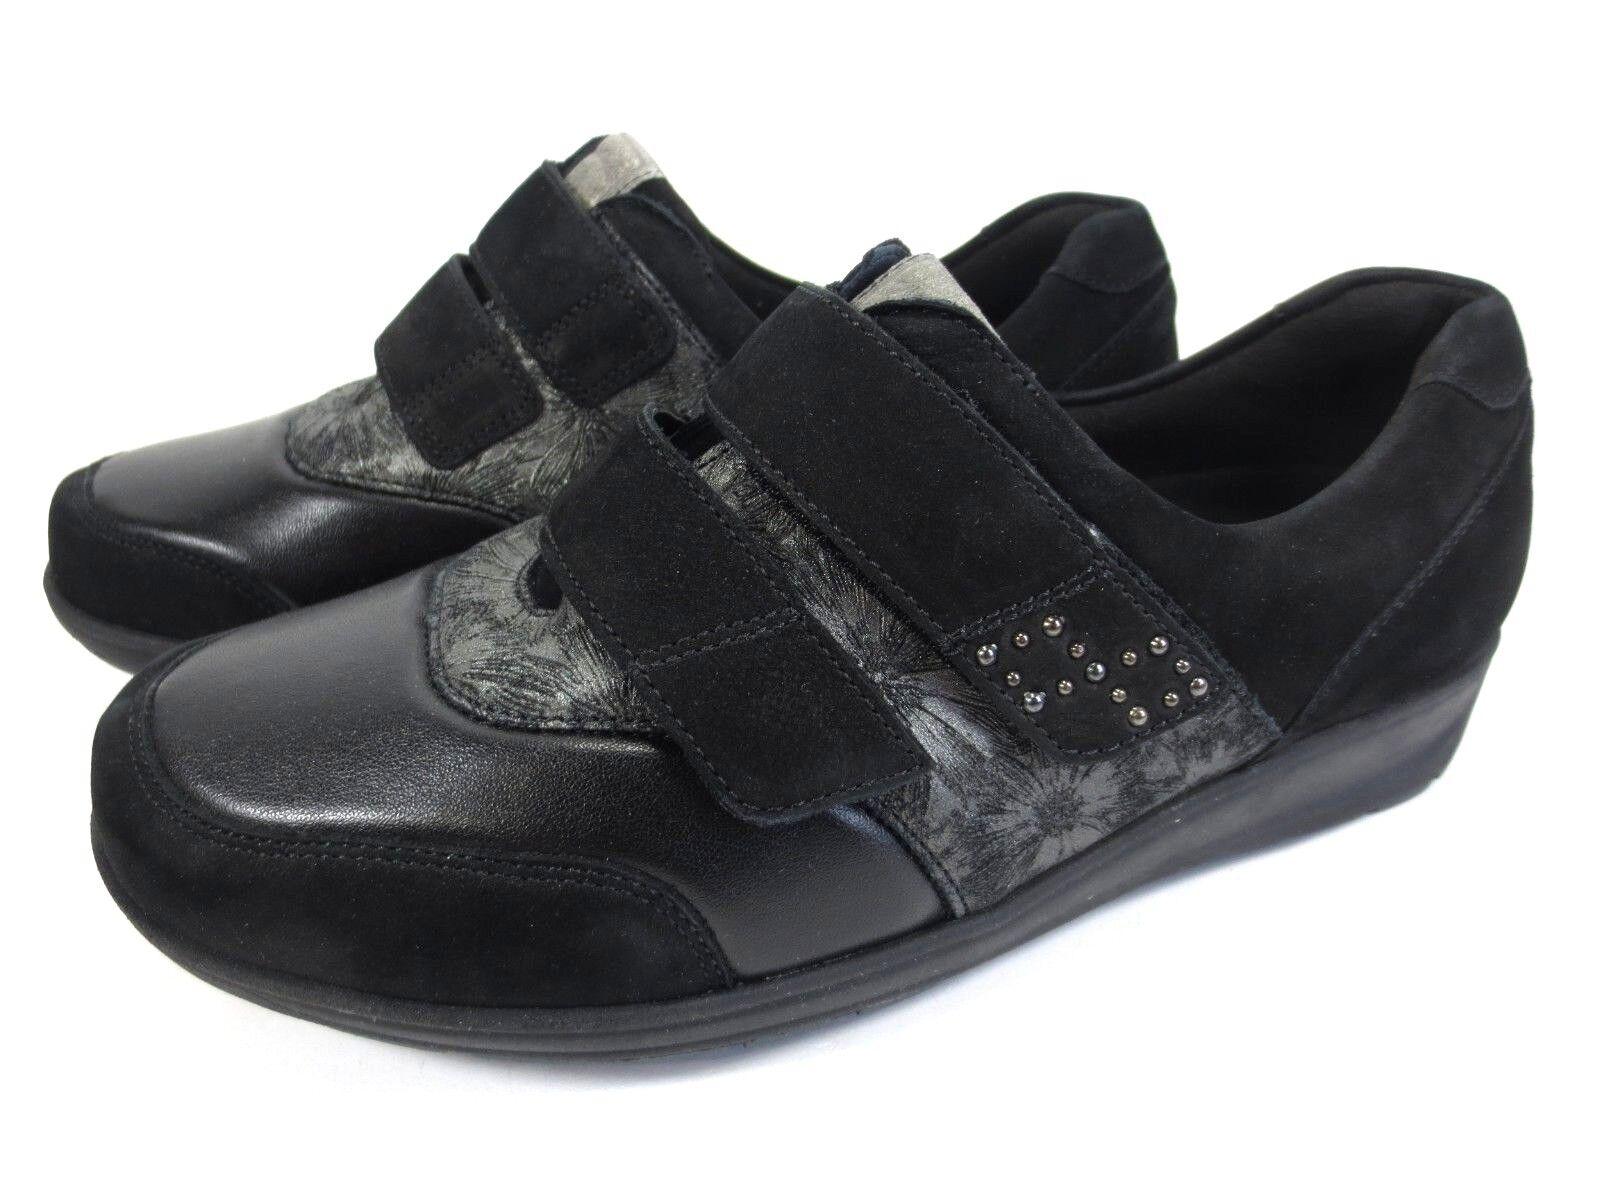 WALDLÄUFER Mimi Soft Leder Schuhe Diabetiker Stretch Gr. 37,5 UK 4,5 M  320